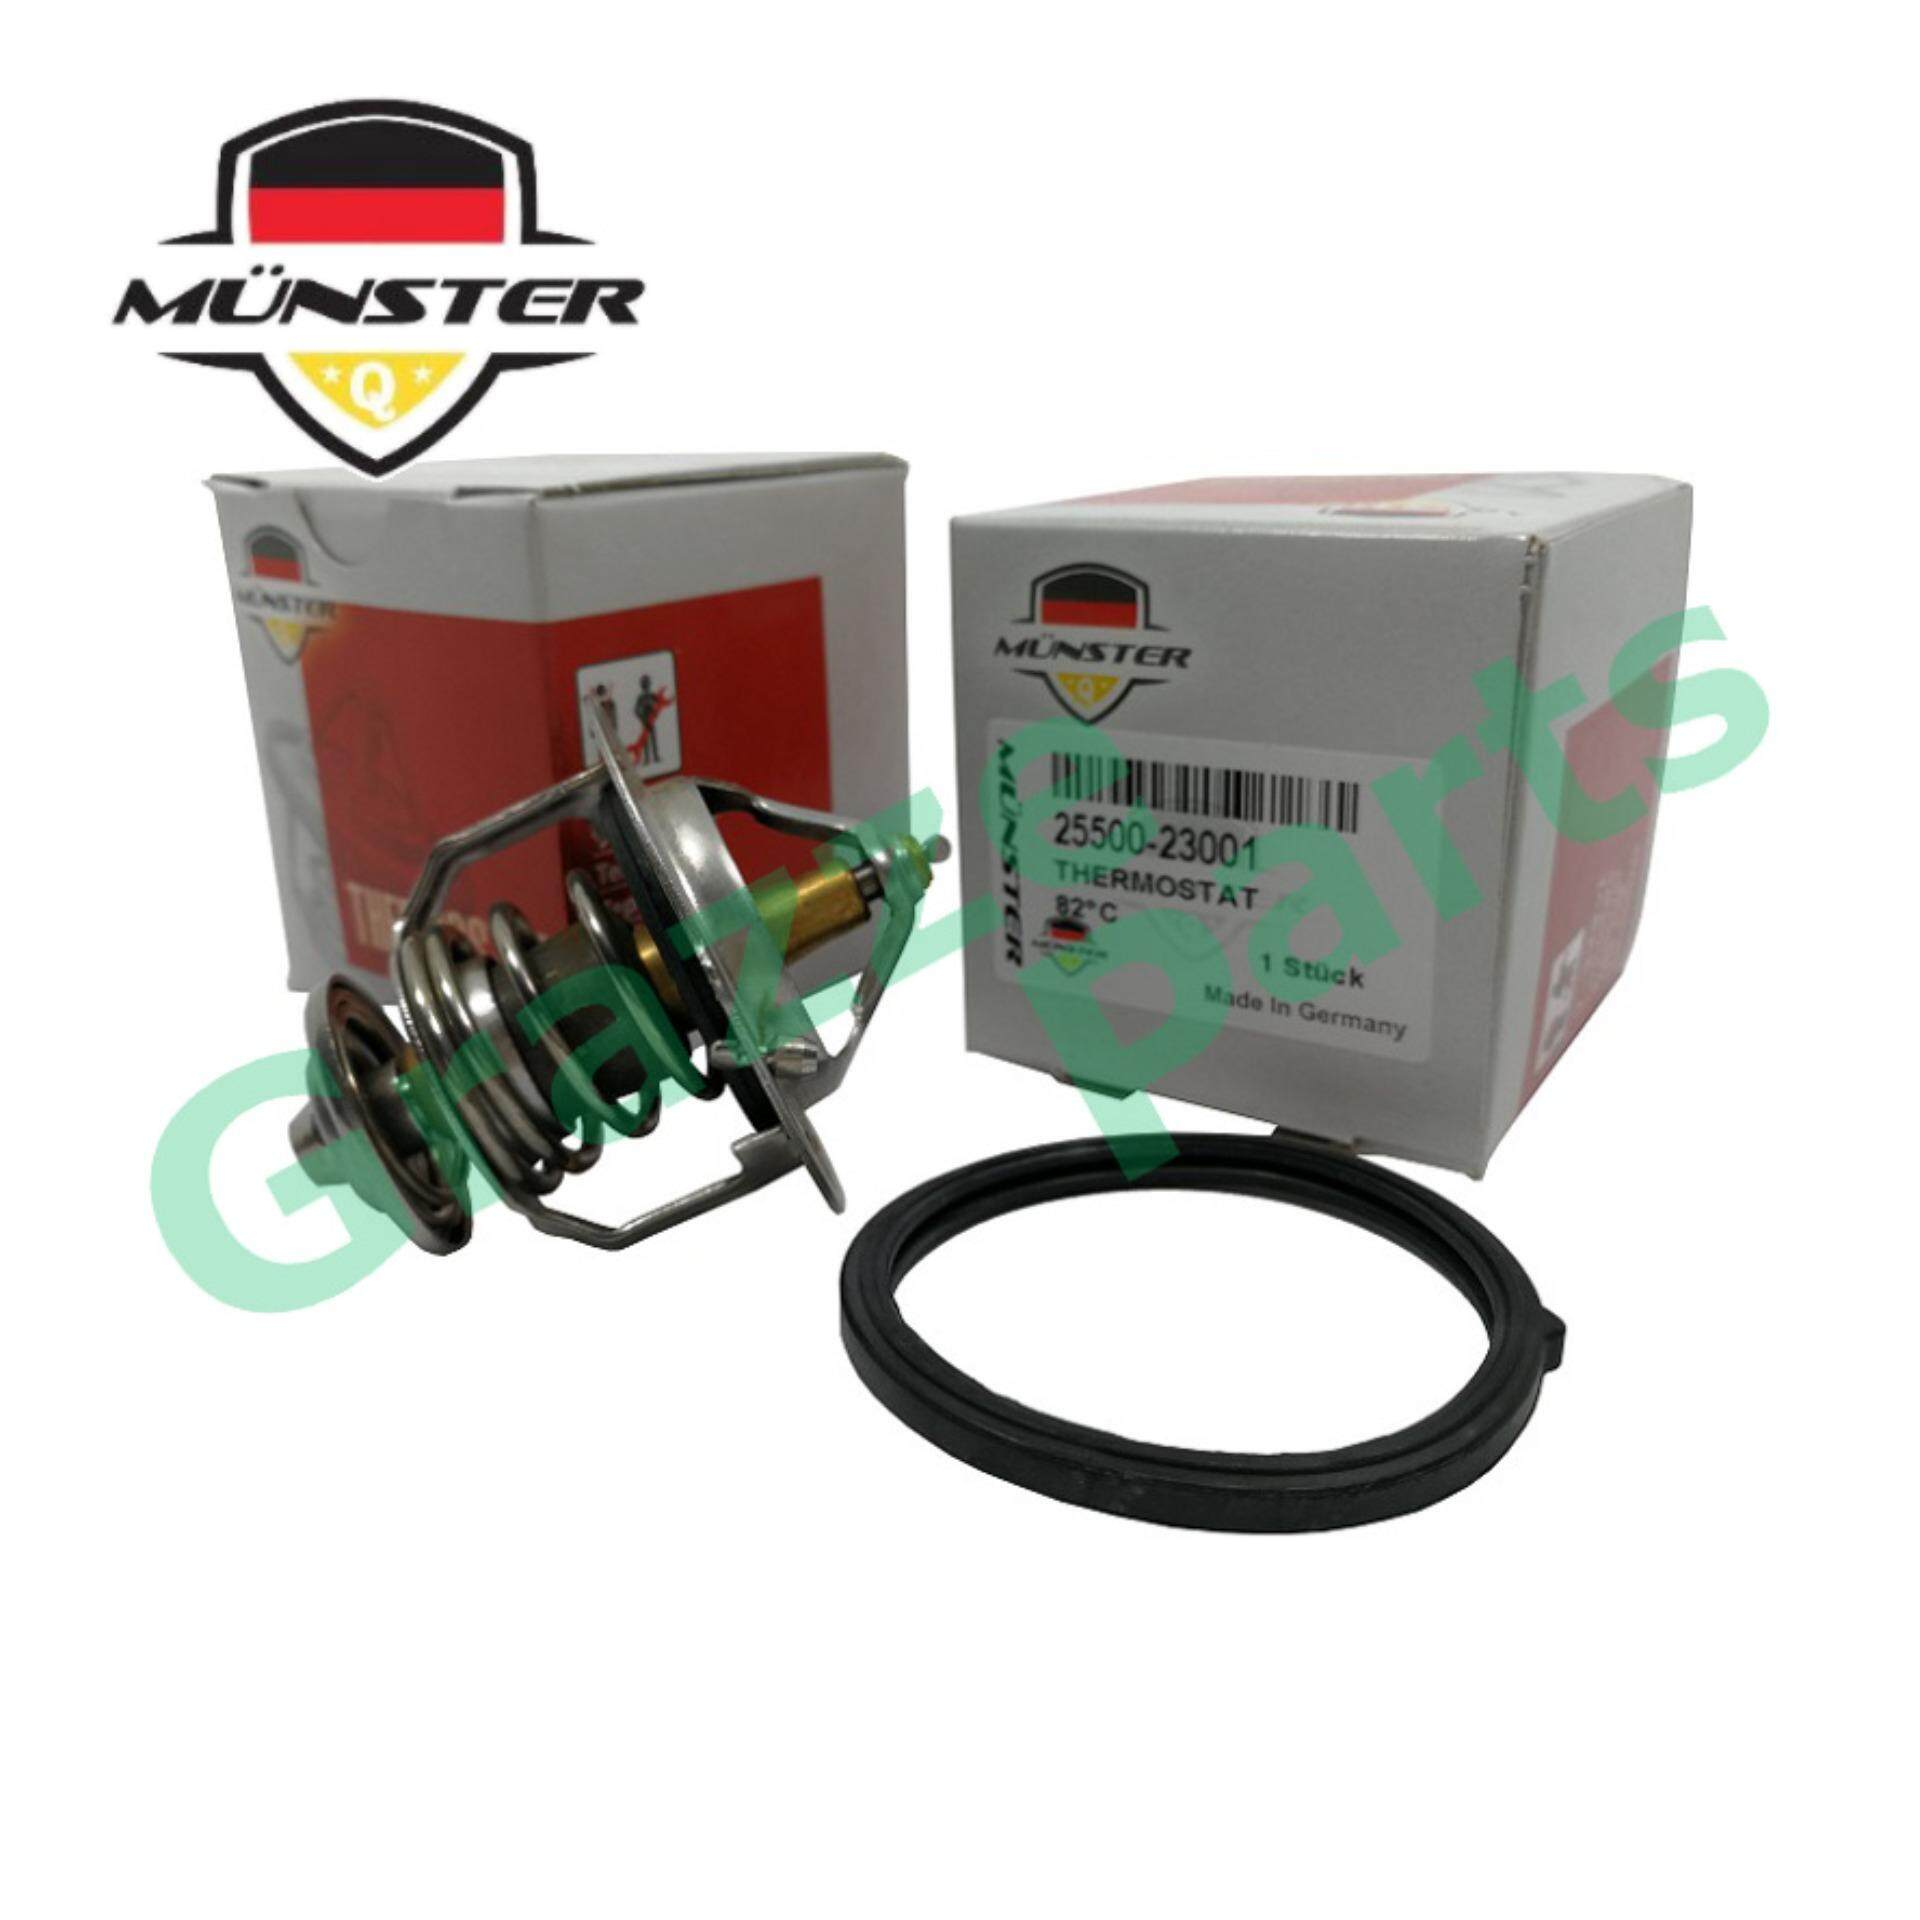 Münster Coolant Thermostat + Sealing Ring for 25500-23001 Hyundai Matrix  Elantra Getz Kia Citra